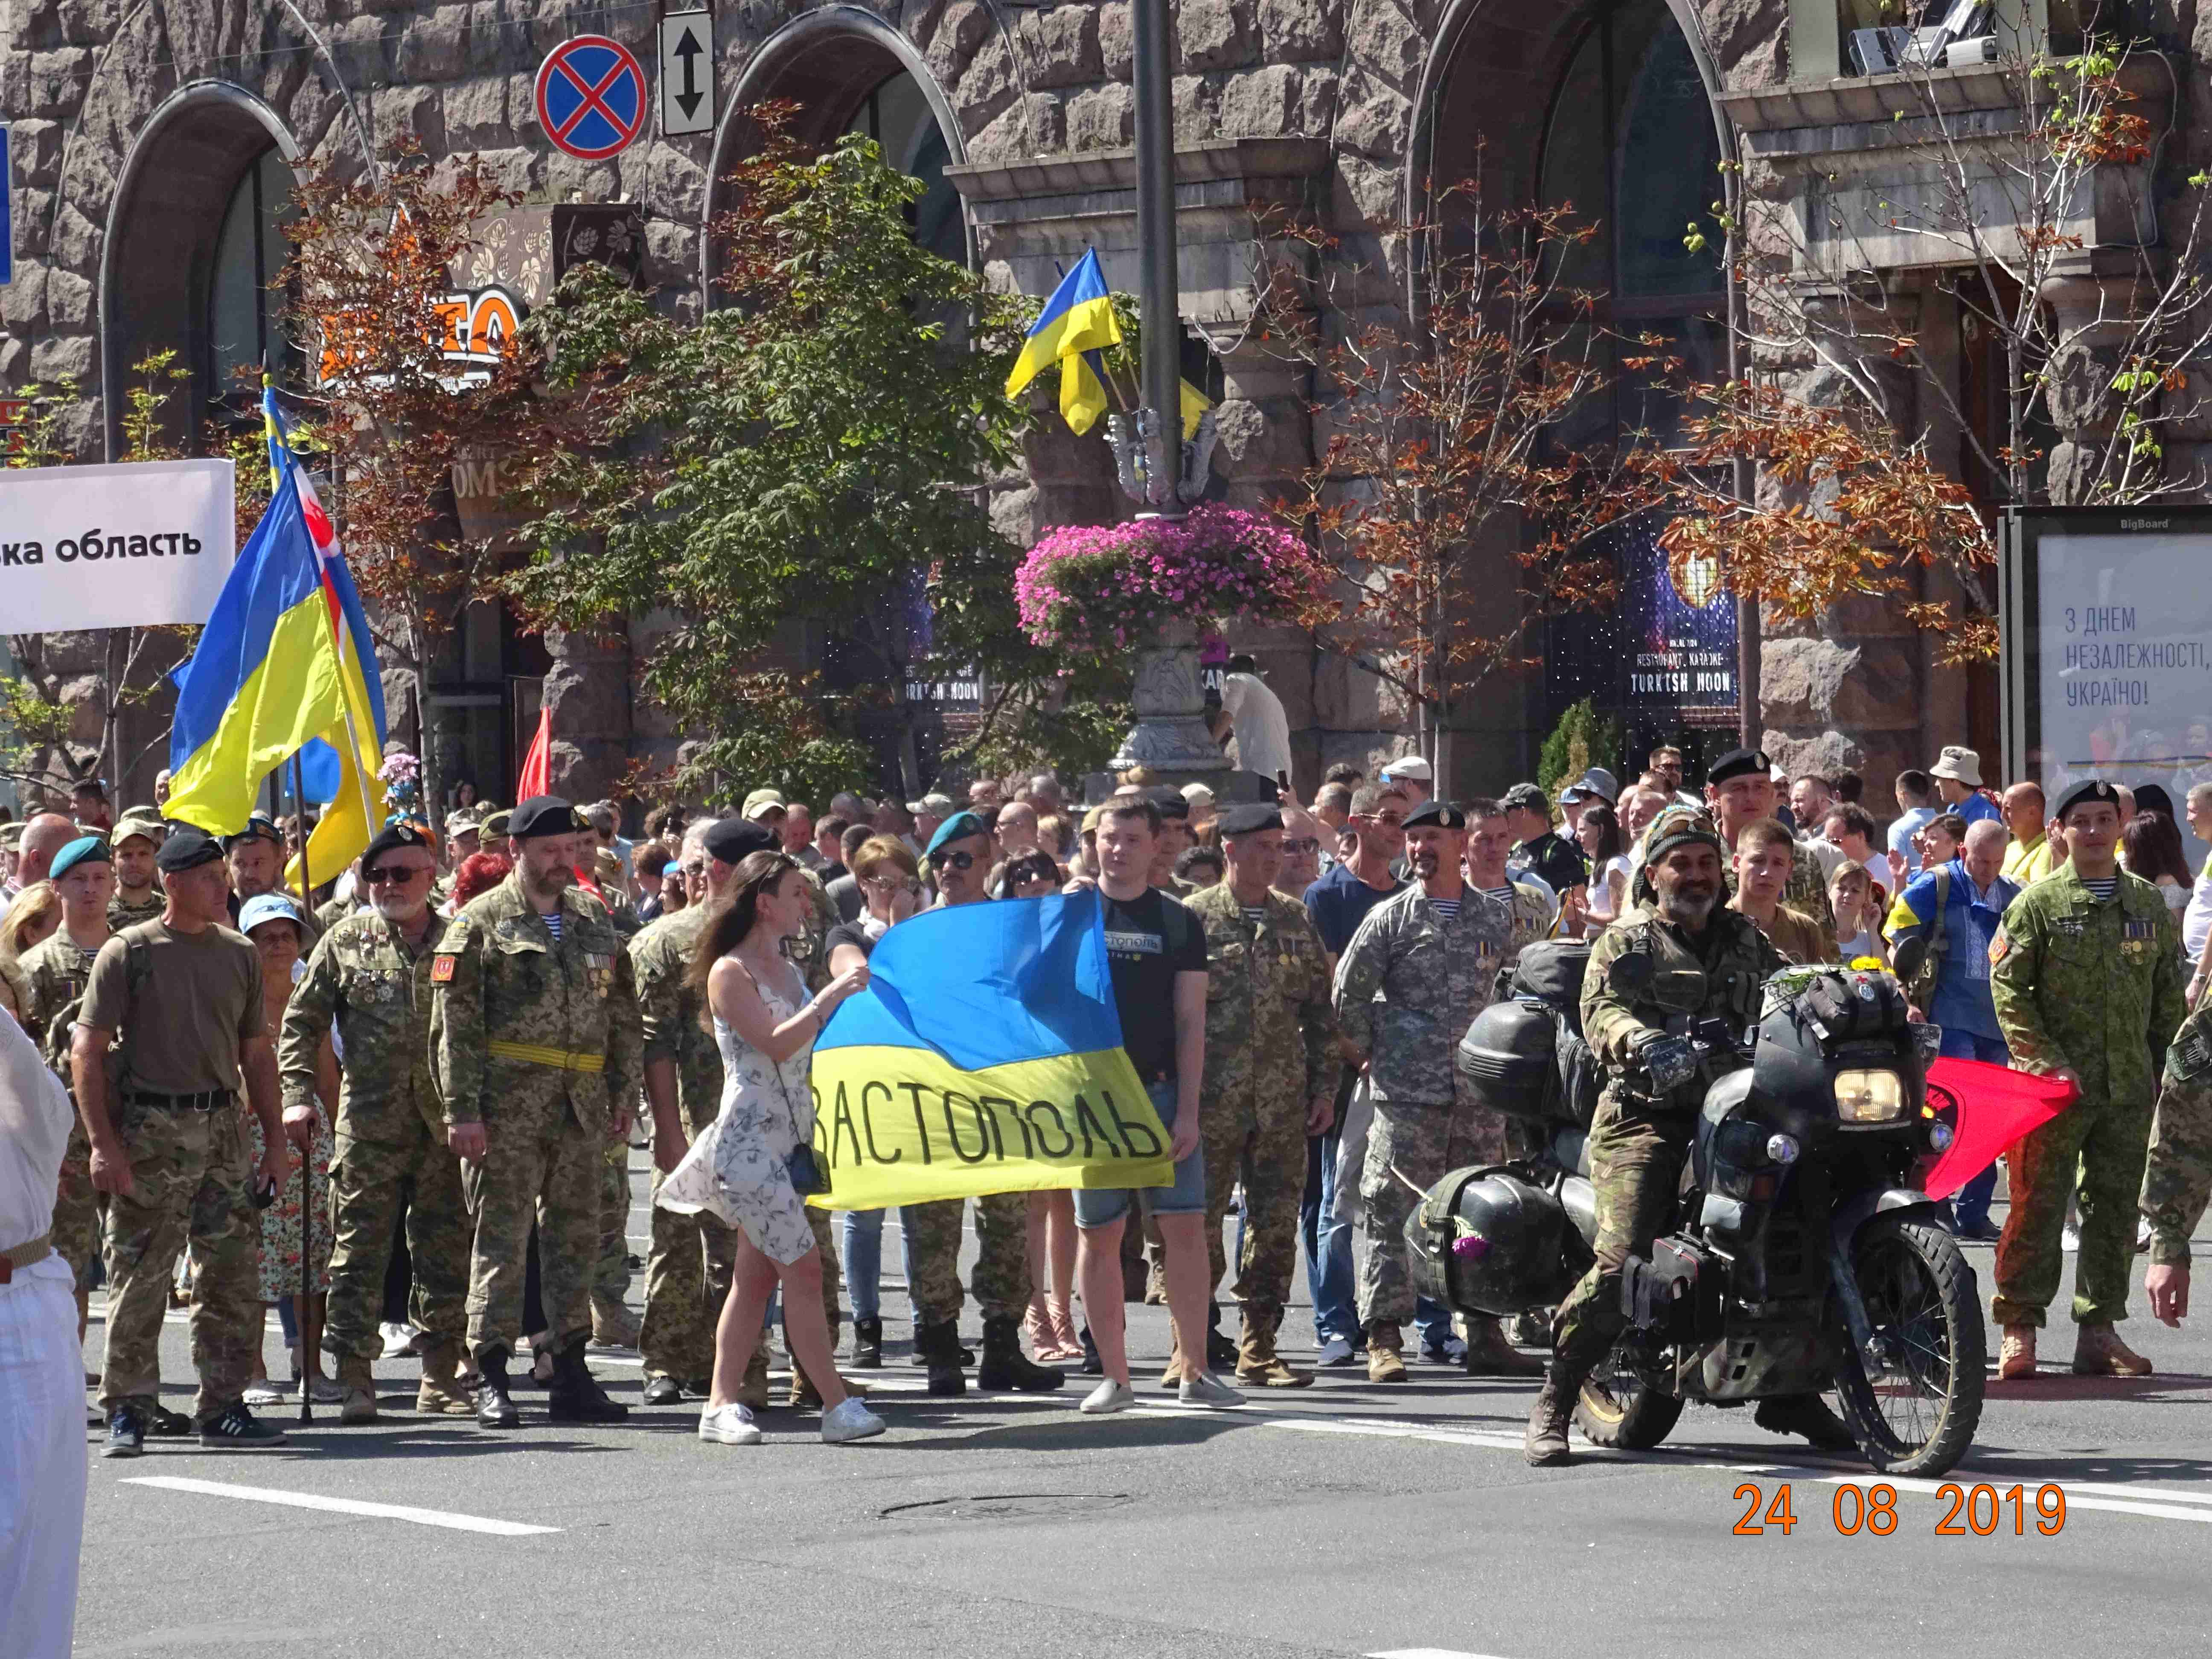 Defenders-of-Ukraine-Parad-24.Aug.19 - DSC06248.jpg